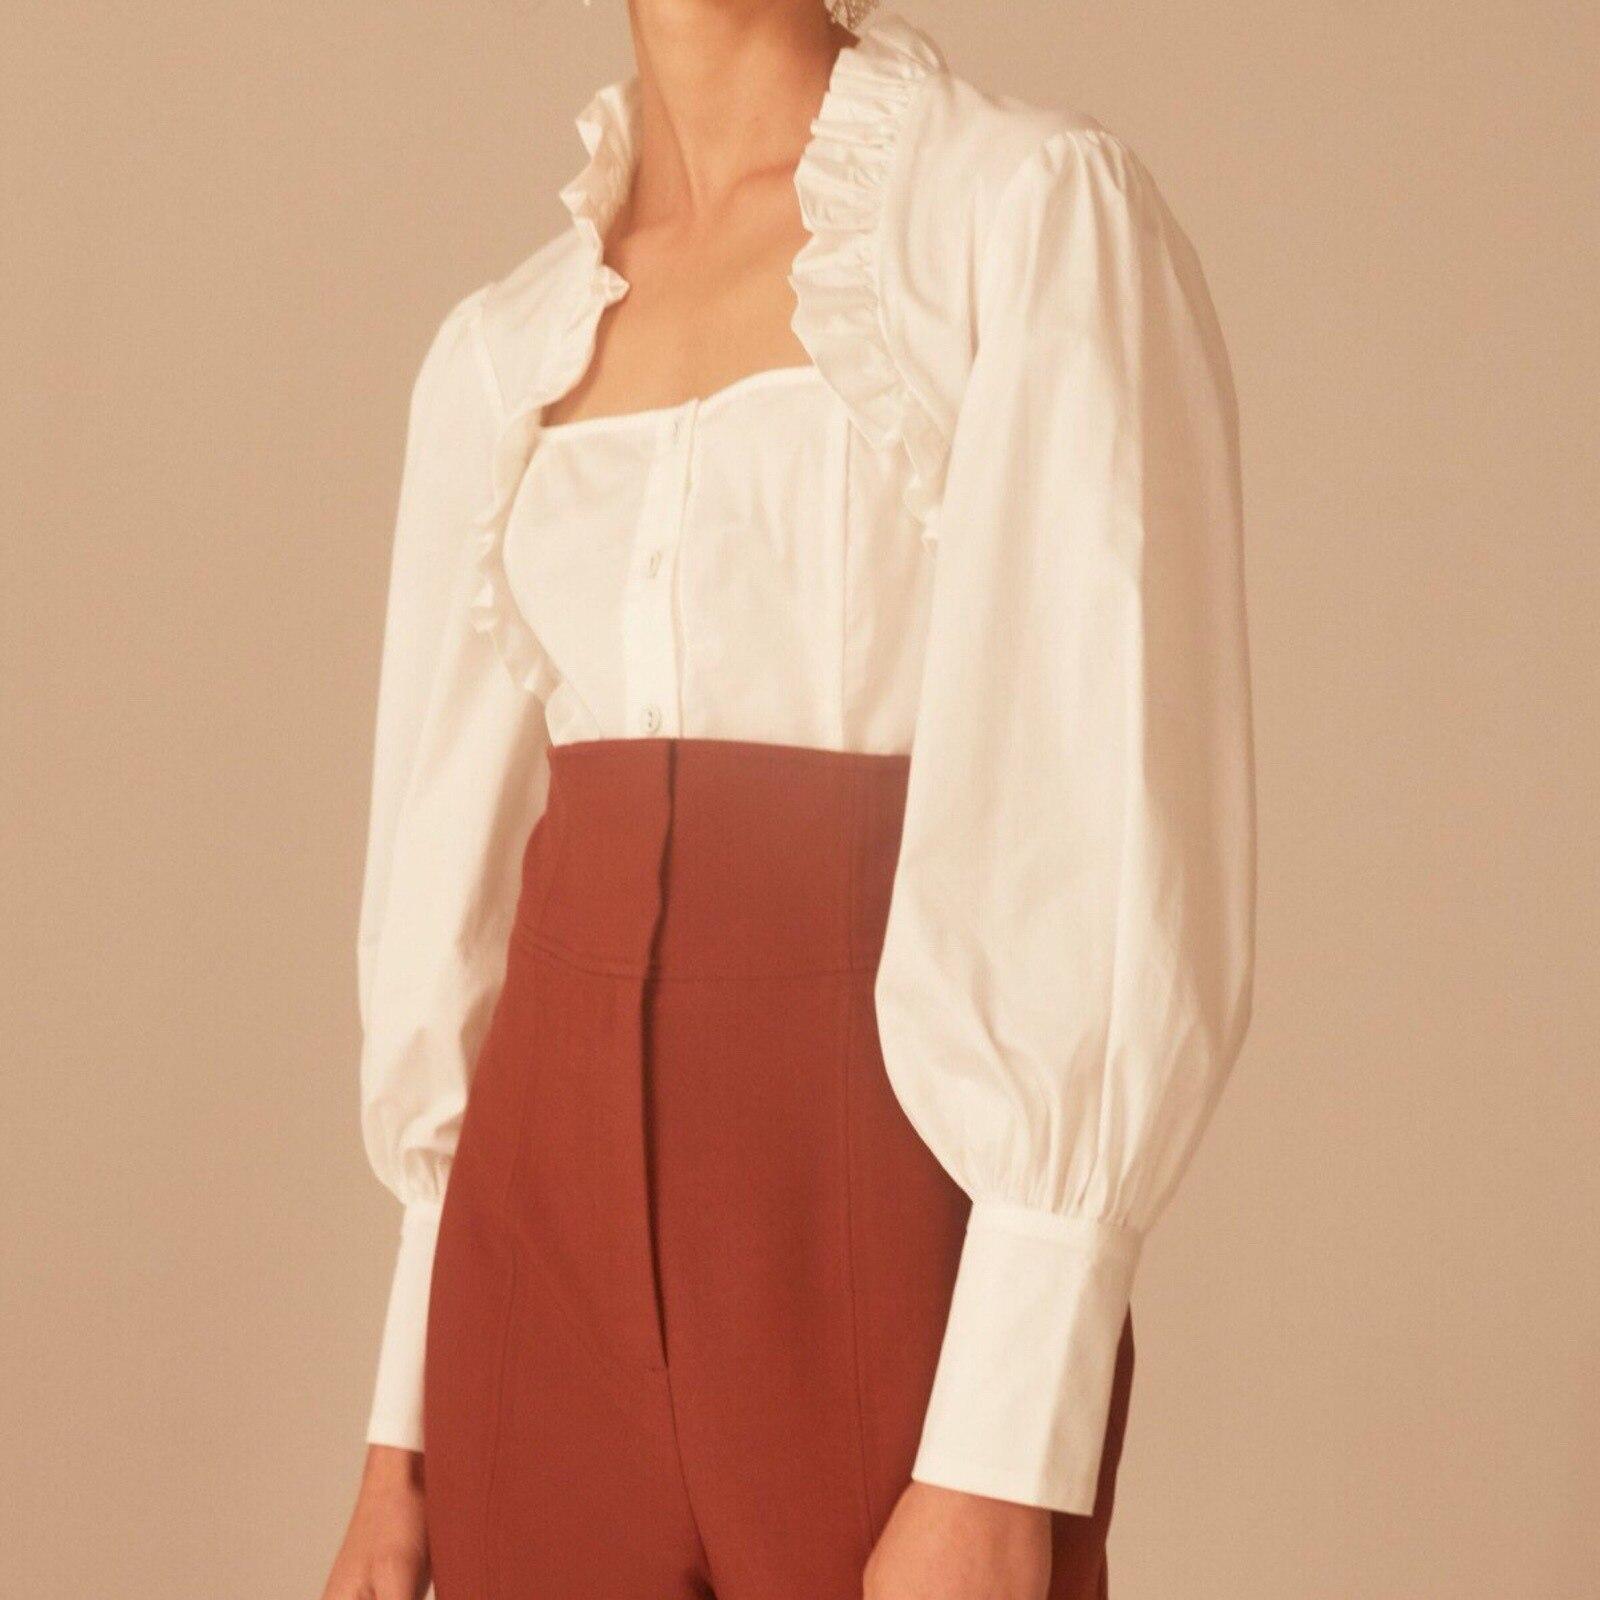 Fashion Female Elegant Tie White Blouses Chiffon Shirt Ladies Blouse Square Collar Ruffles Women Top Women Sexy Shirt Solid Full